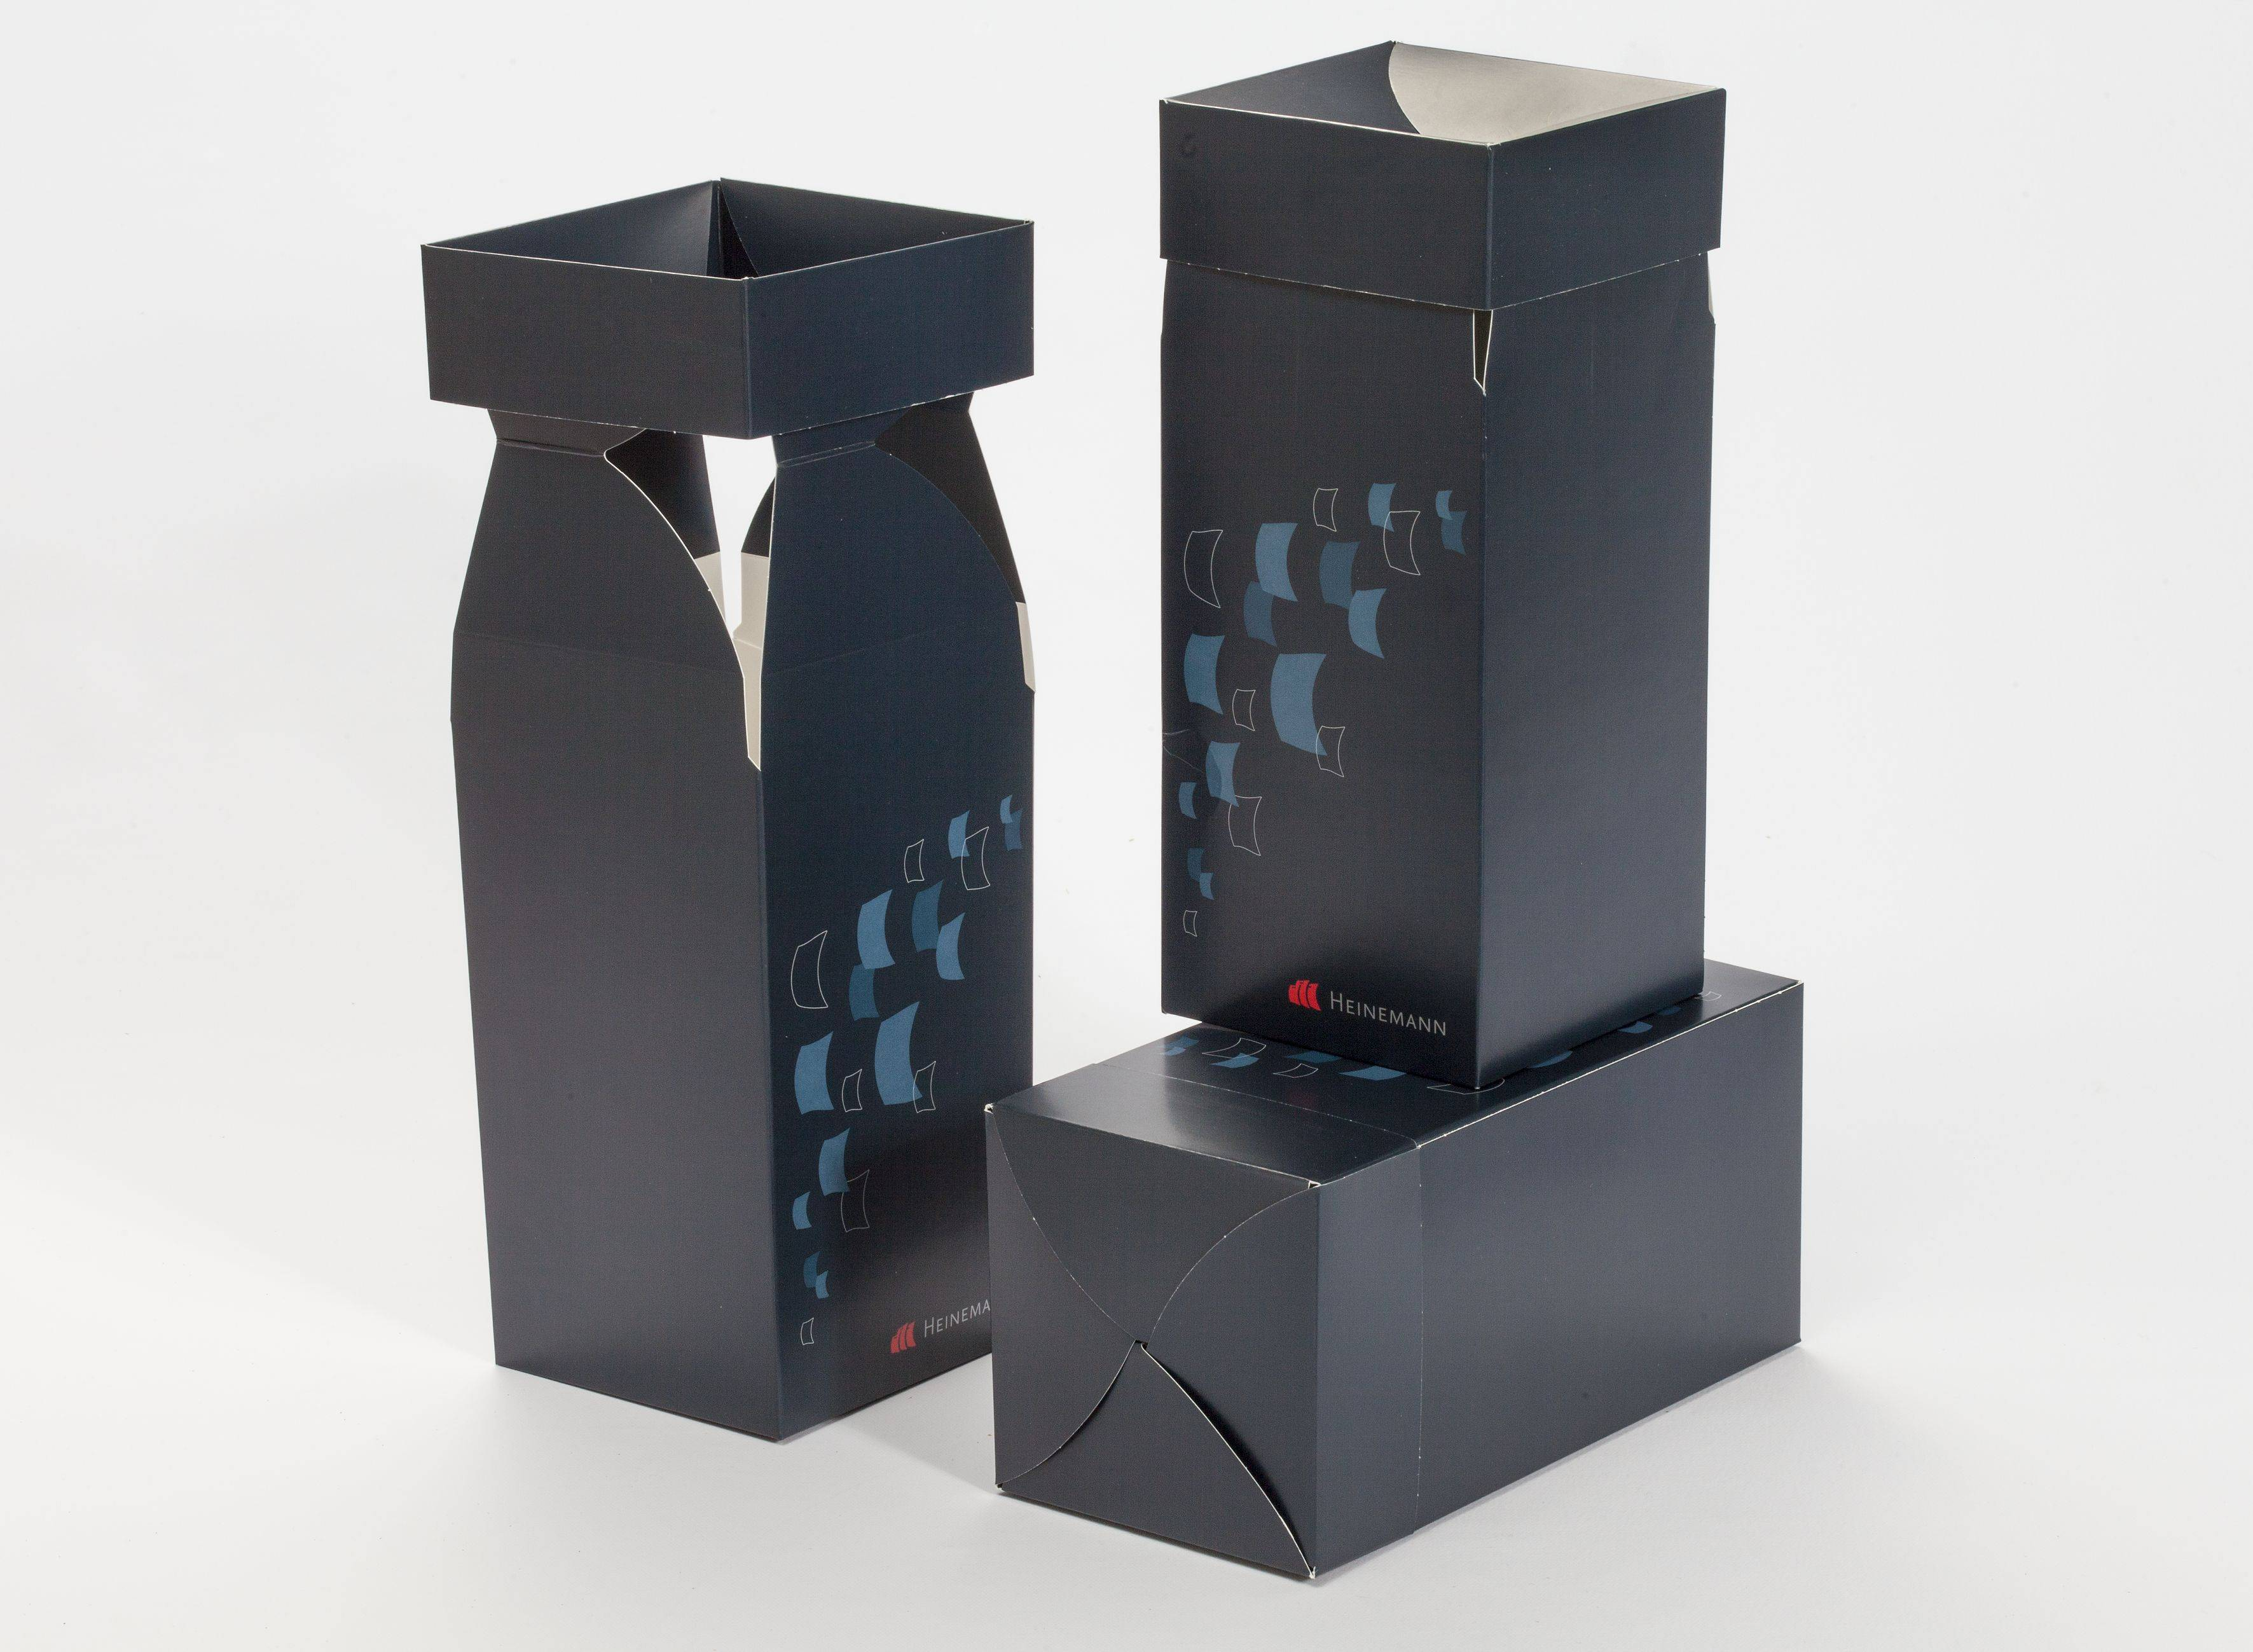 carton-award-image 17037